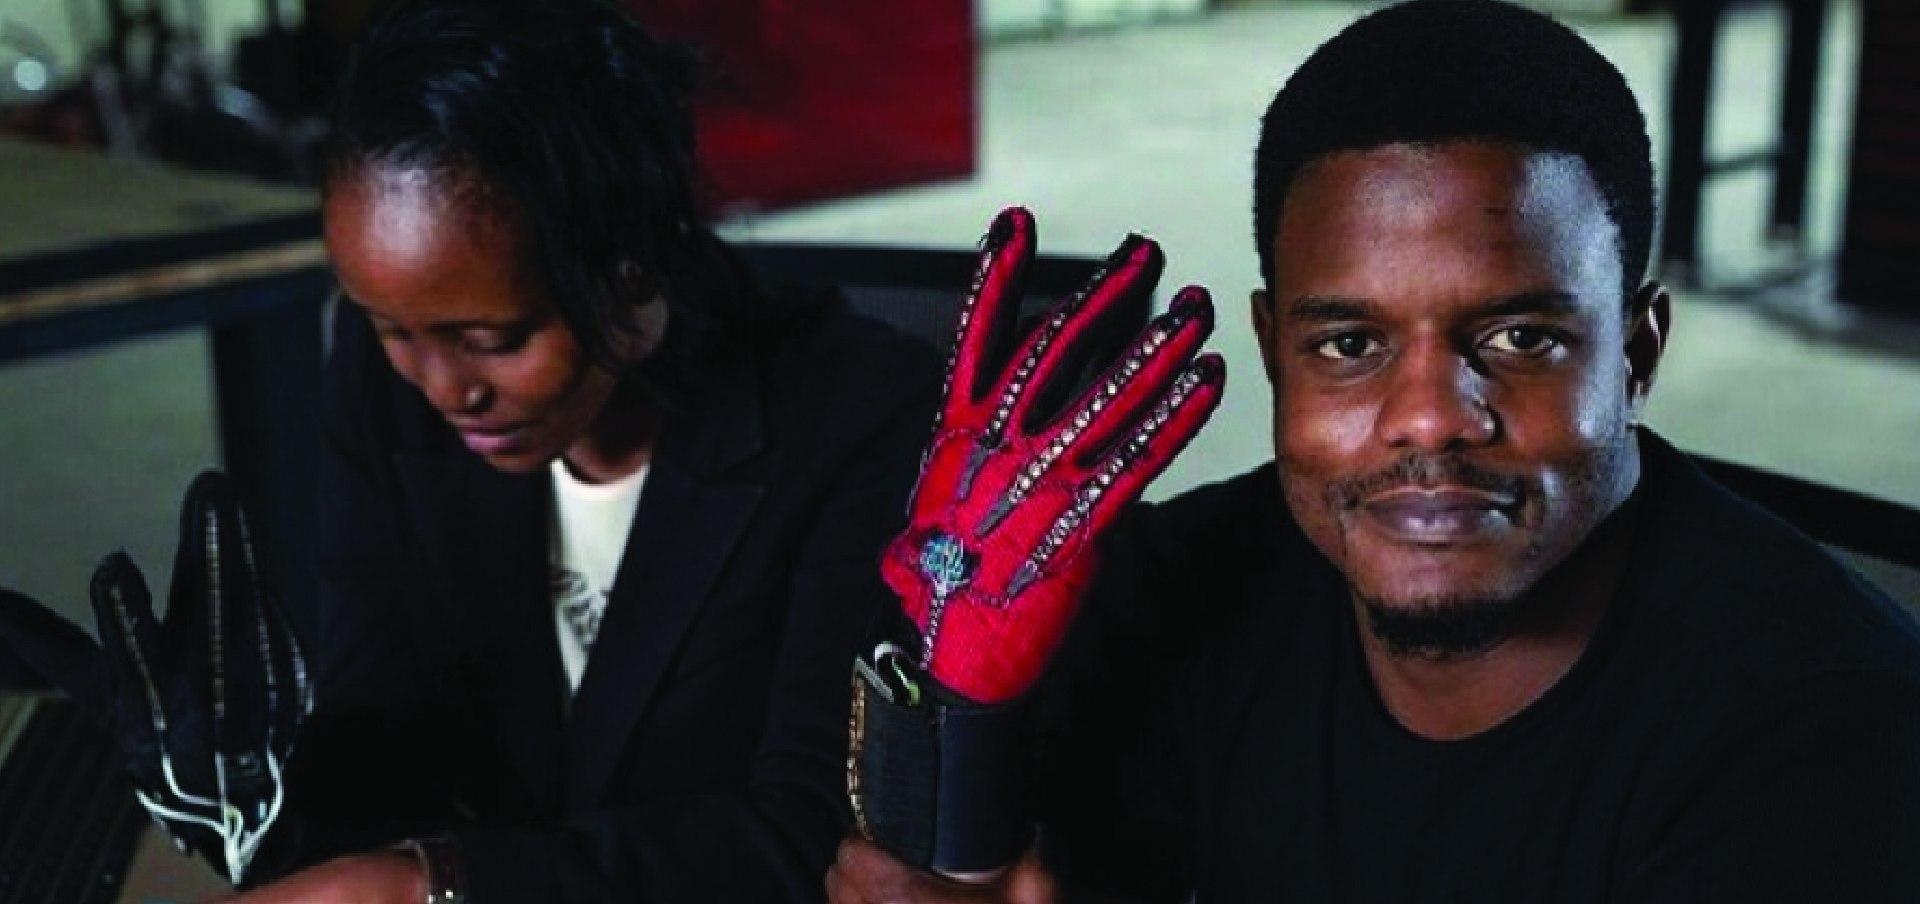 Smart Hand Gloves That Convert Sign Language Into Audio Speech